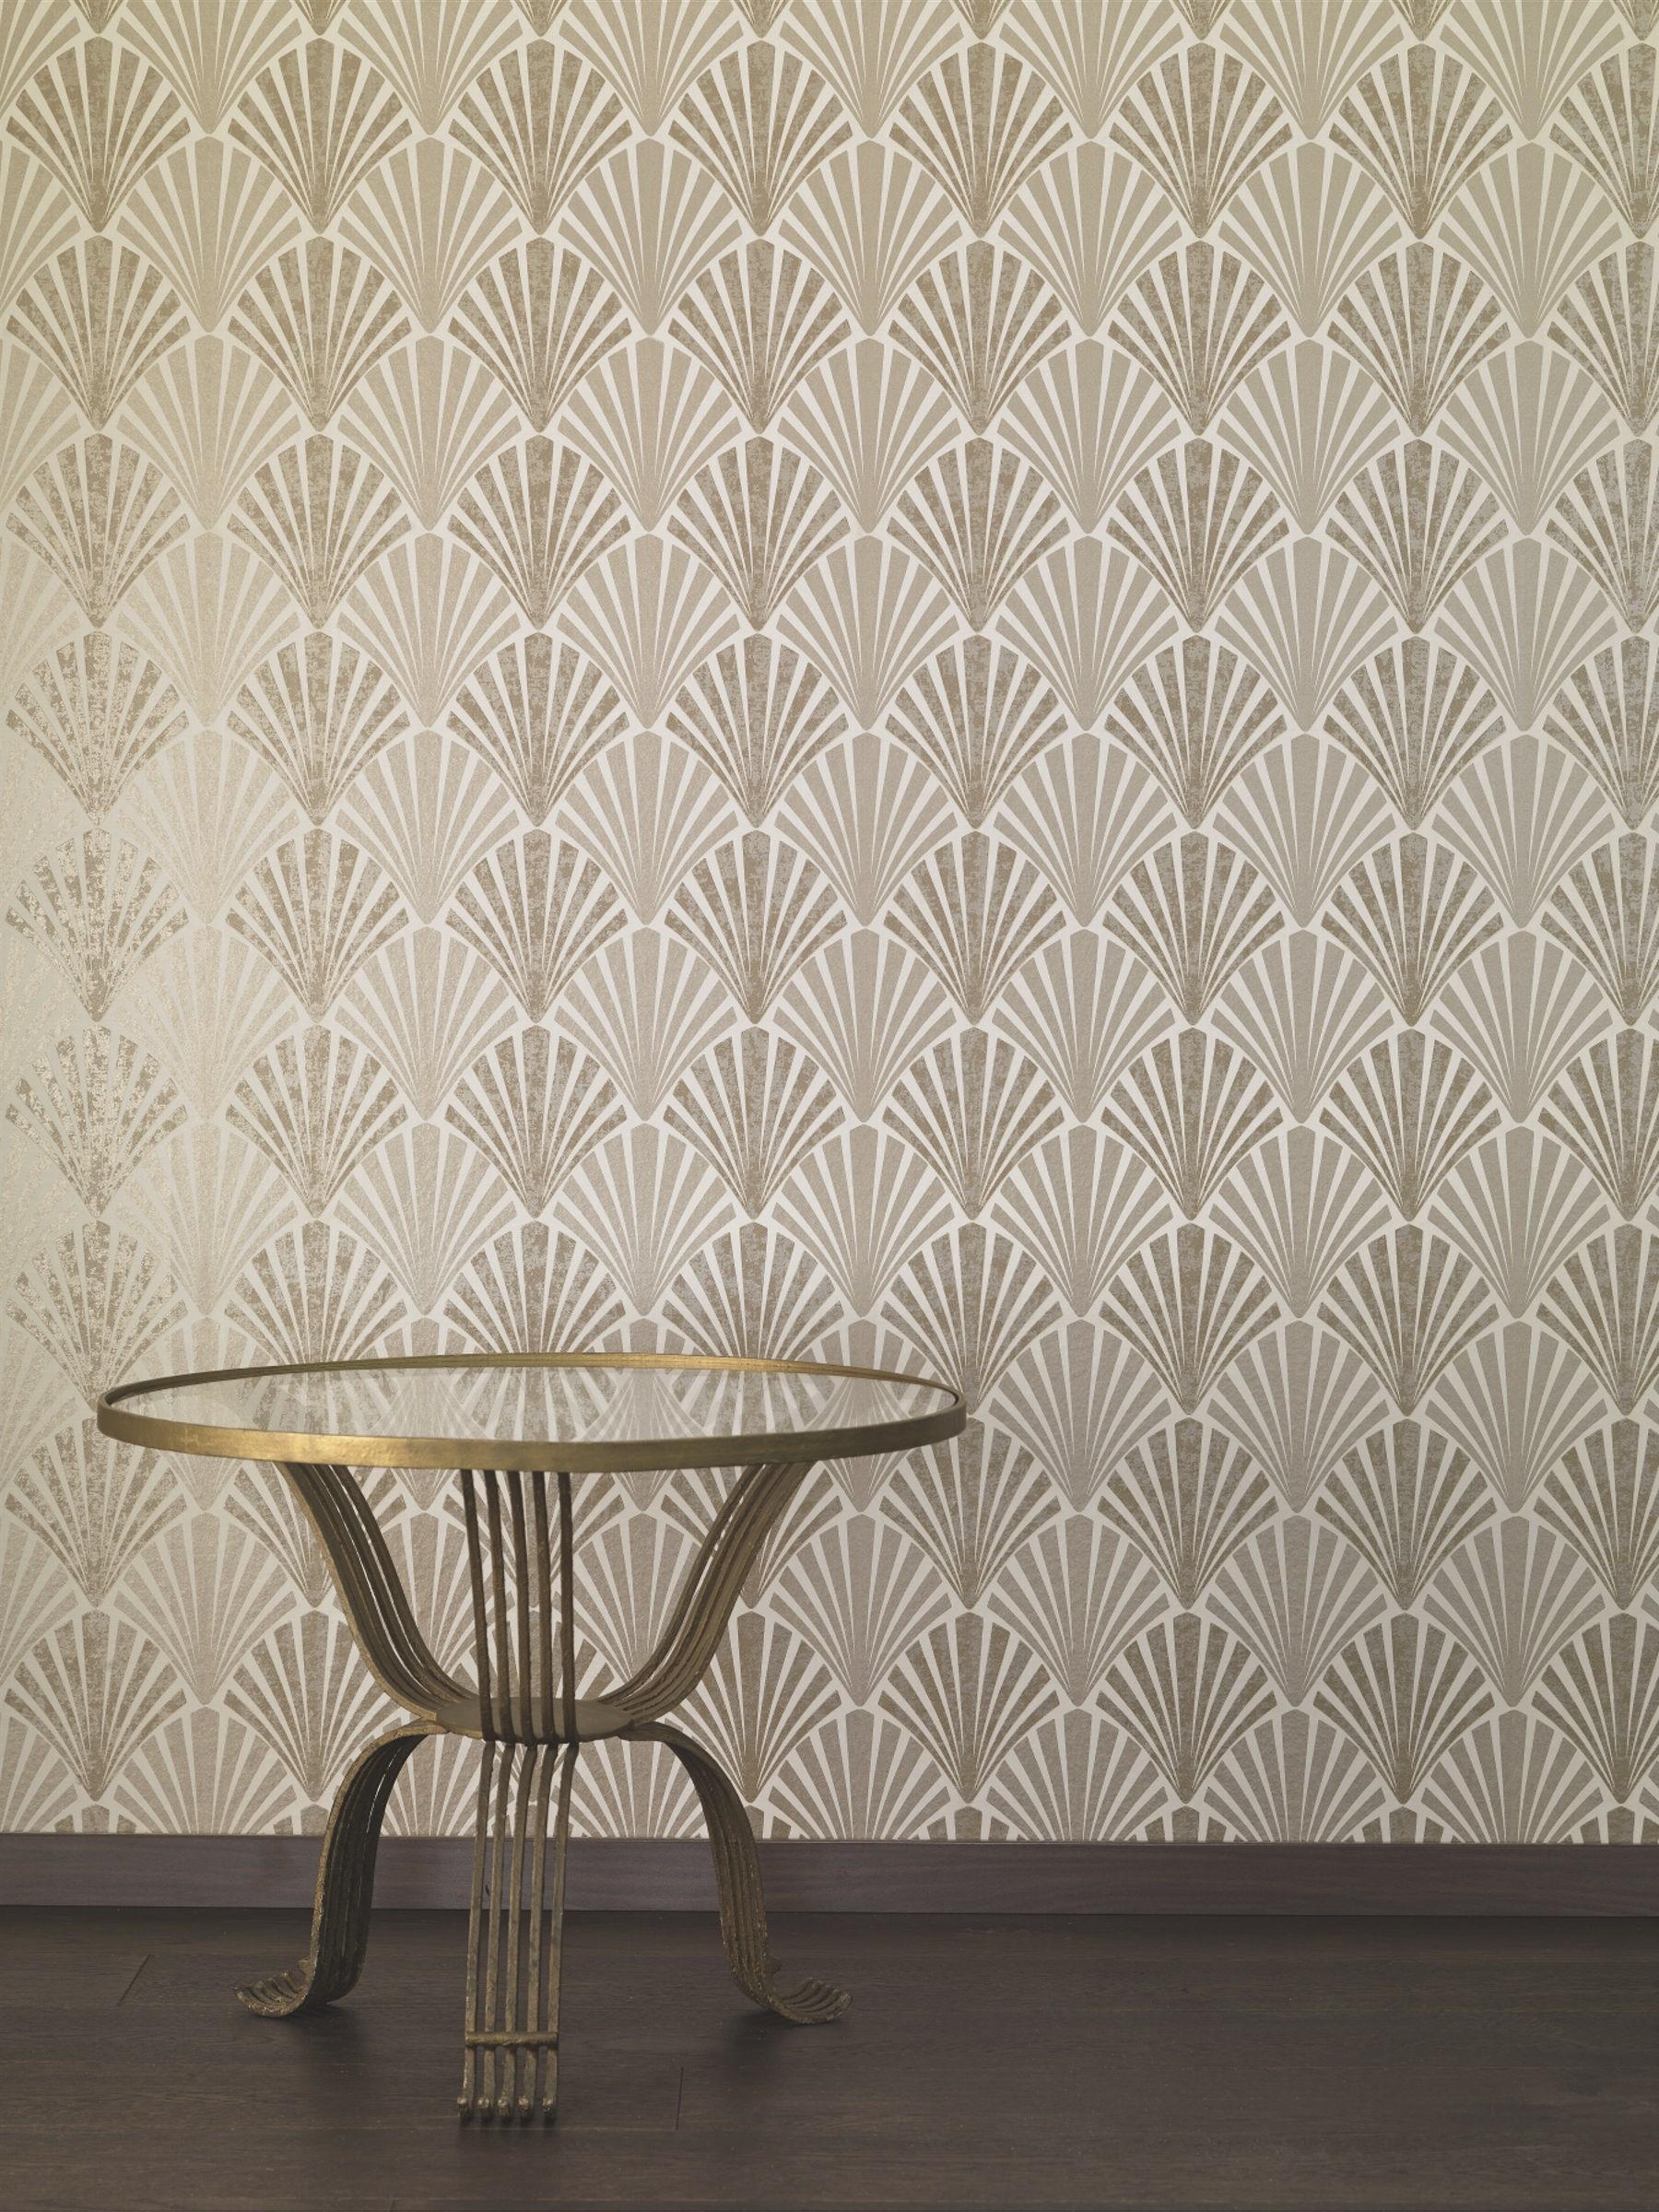 wallpapers swing 4 4049 070 jab anstoetz fabrics. Black Bedroom Furniture Sets. Home Design Ideas